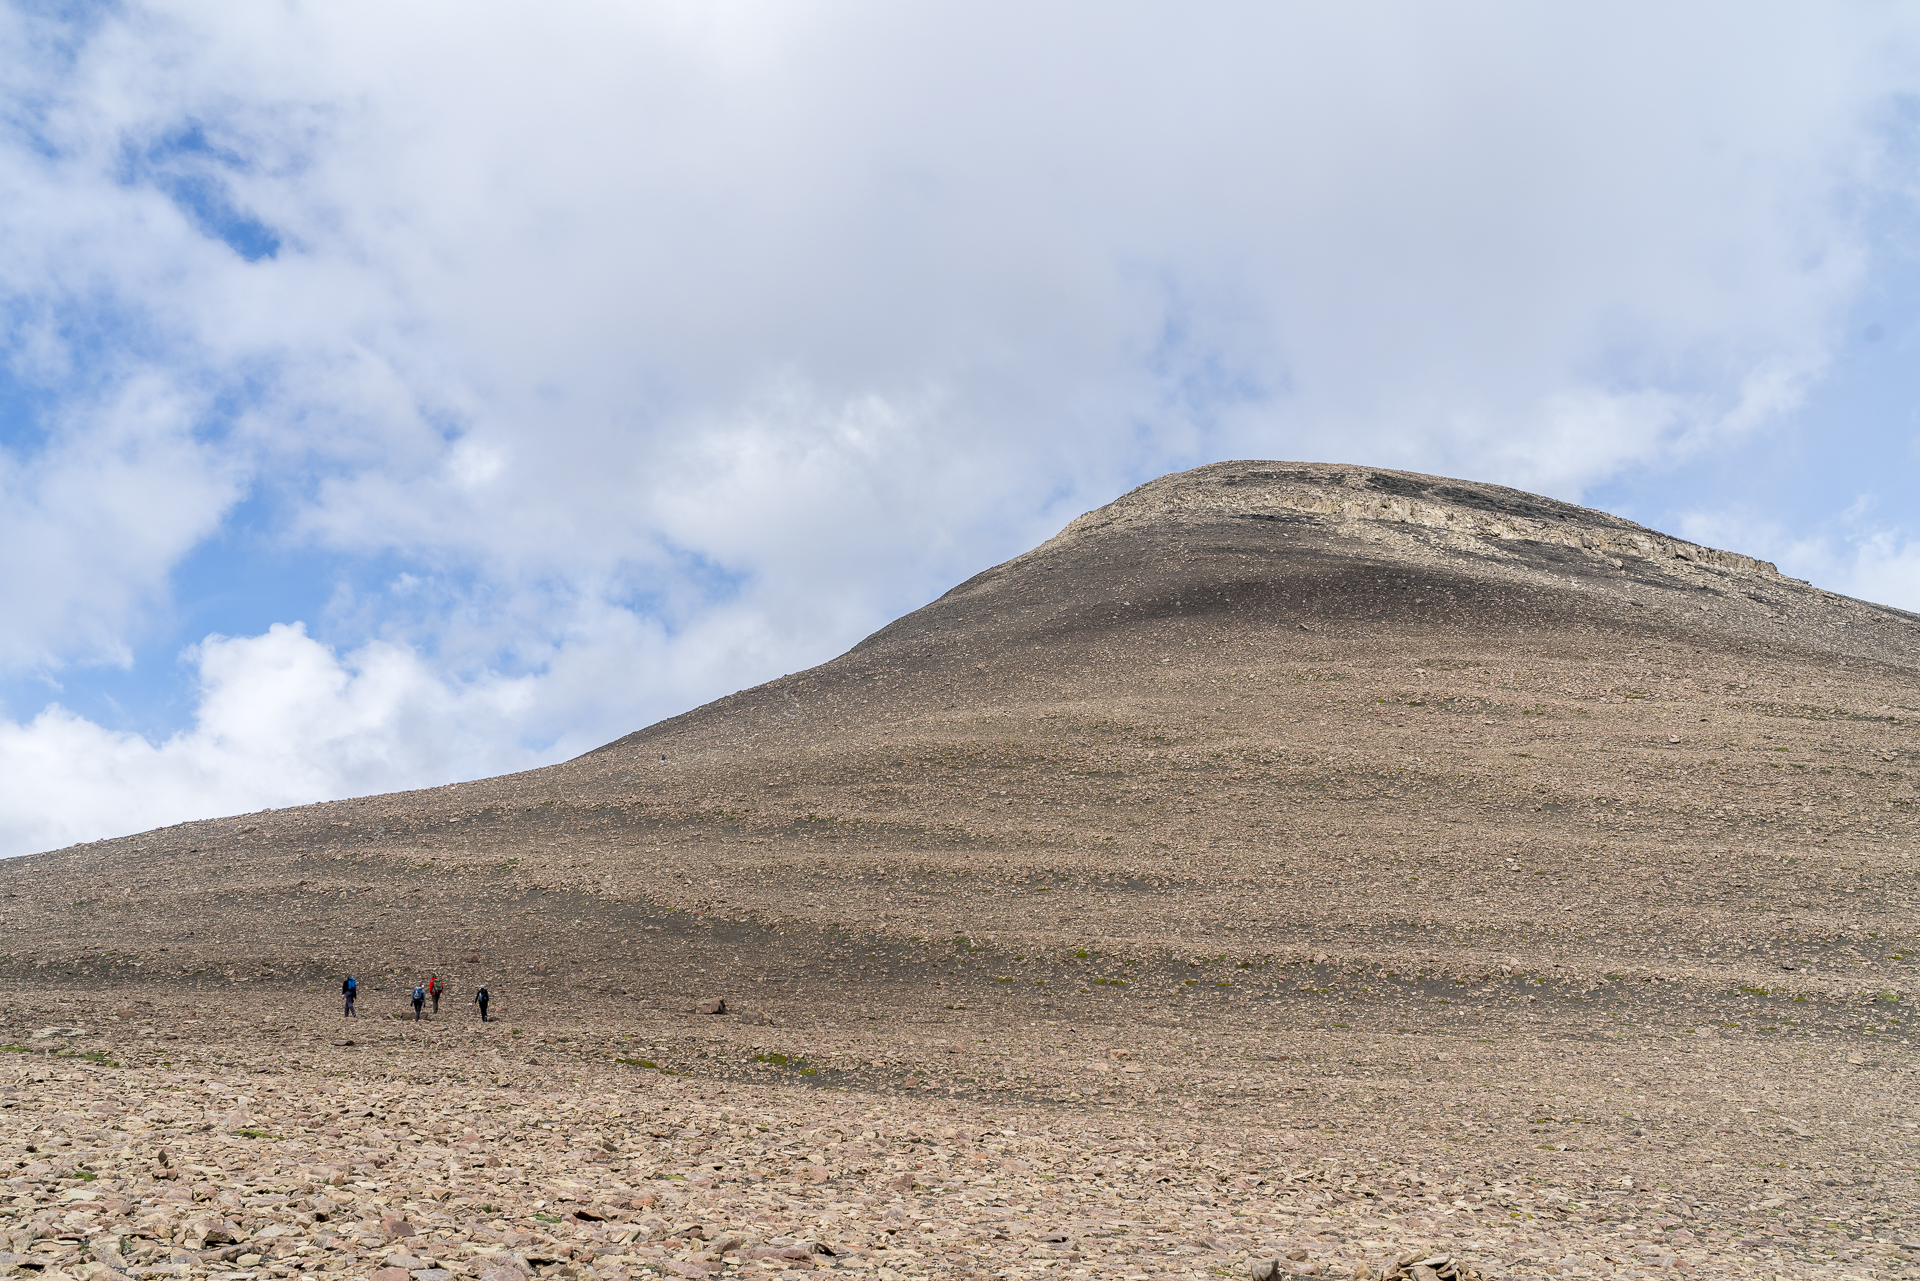 Wanderung zum Gipfel Loma del Pligue Tumbado